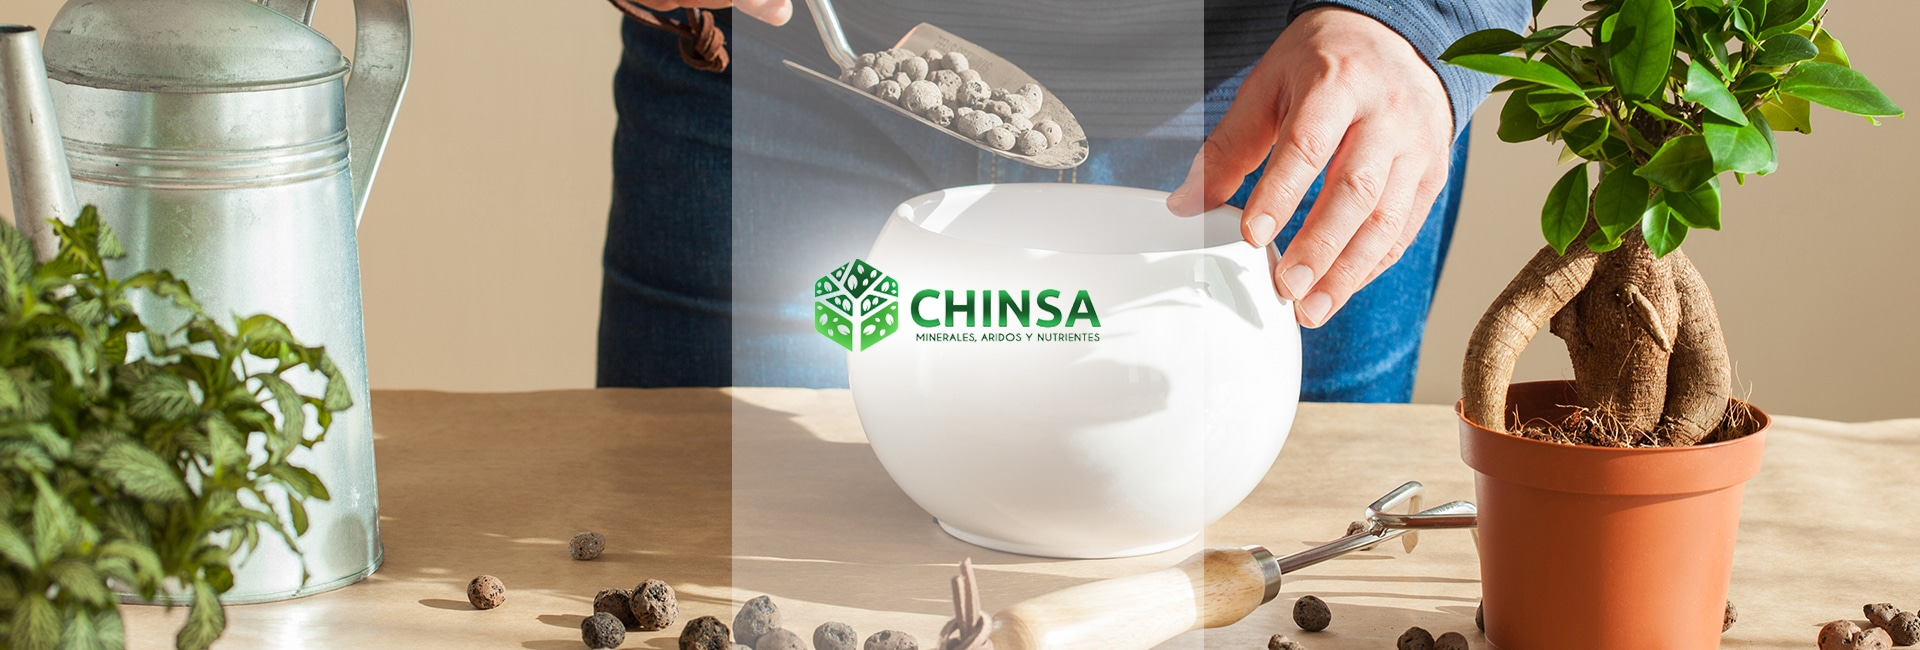 chinsa-banner-2